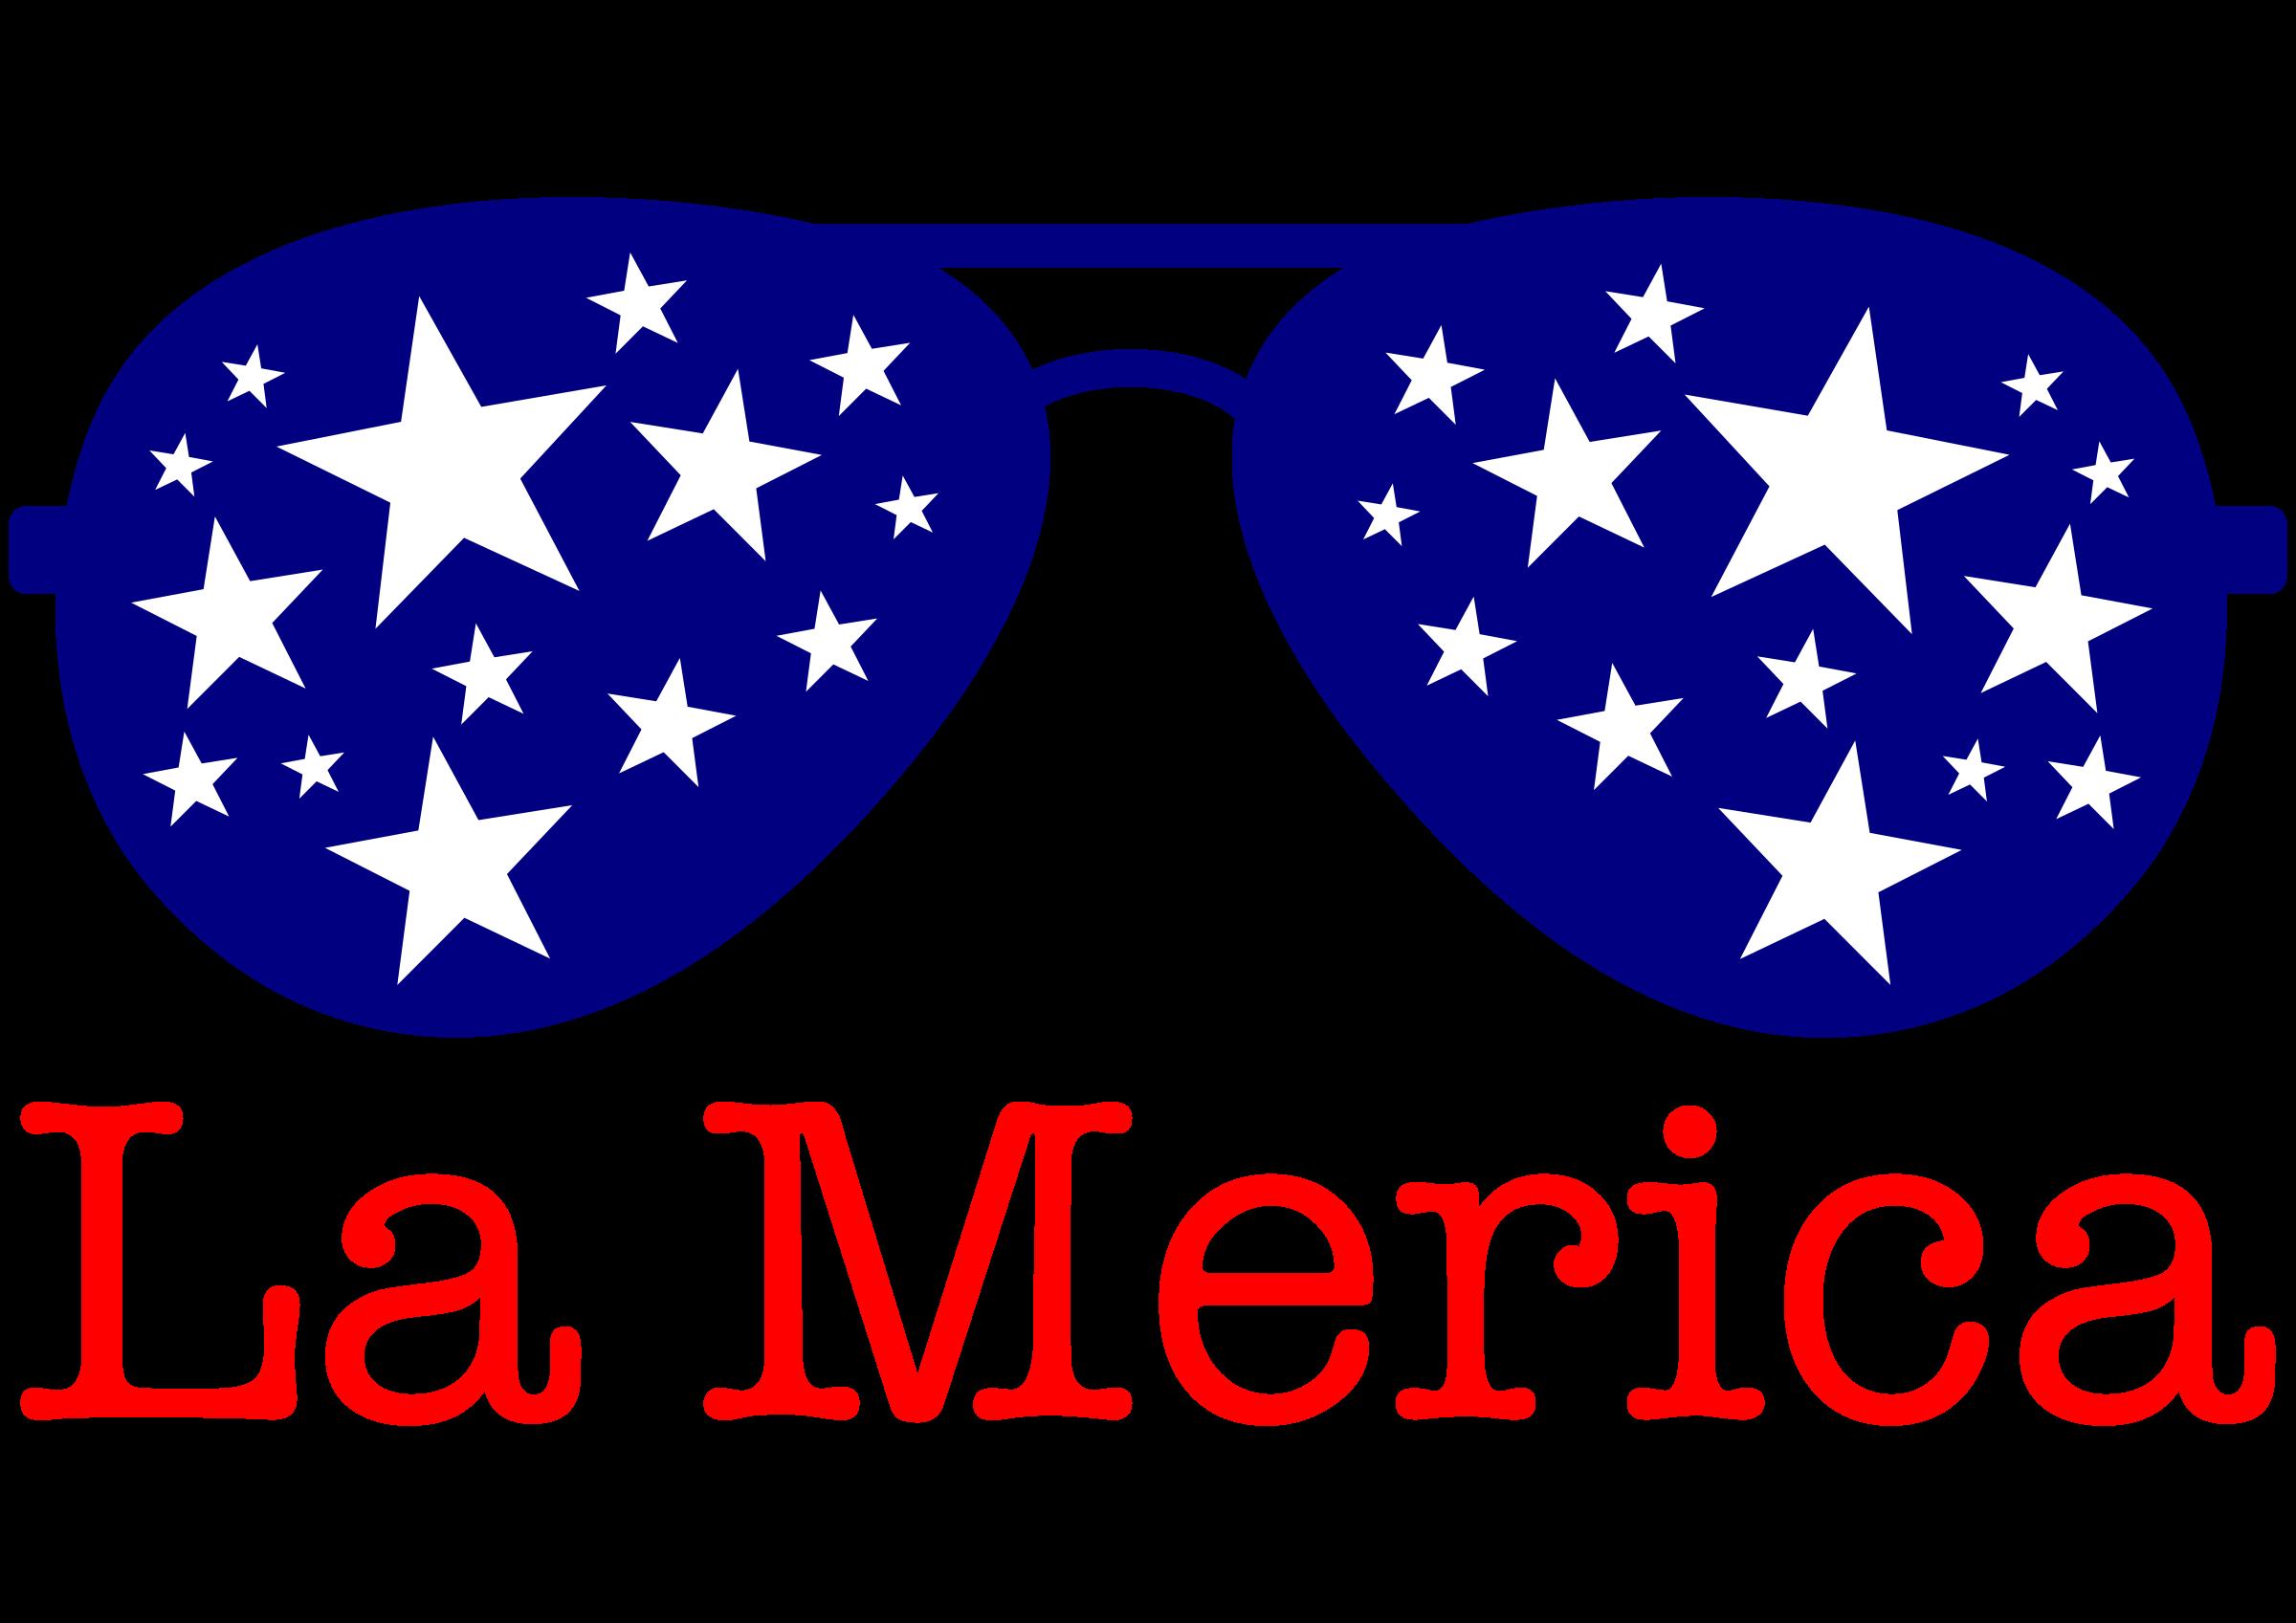 Lamerica big image png. Clipart sunglasses merica